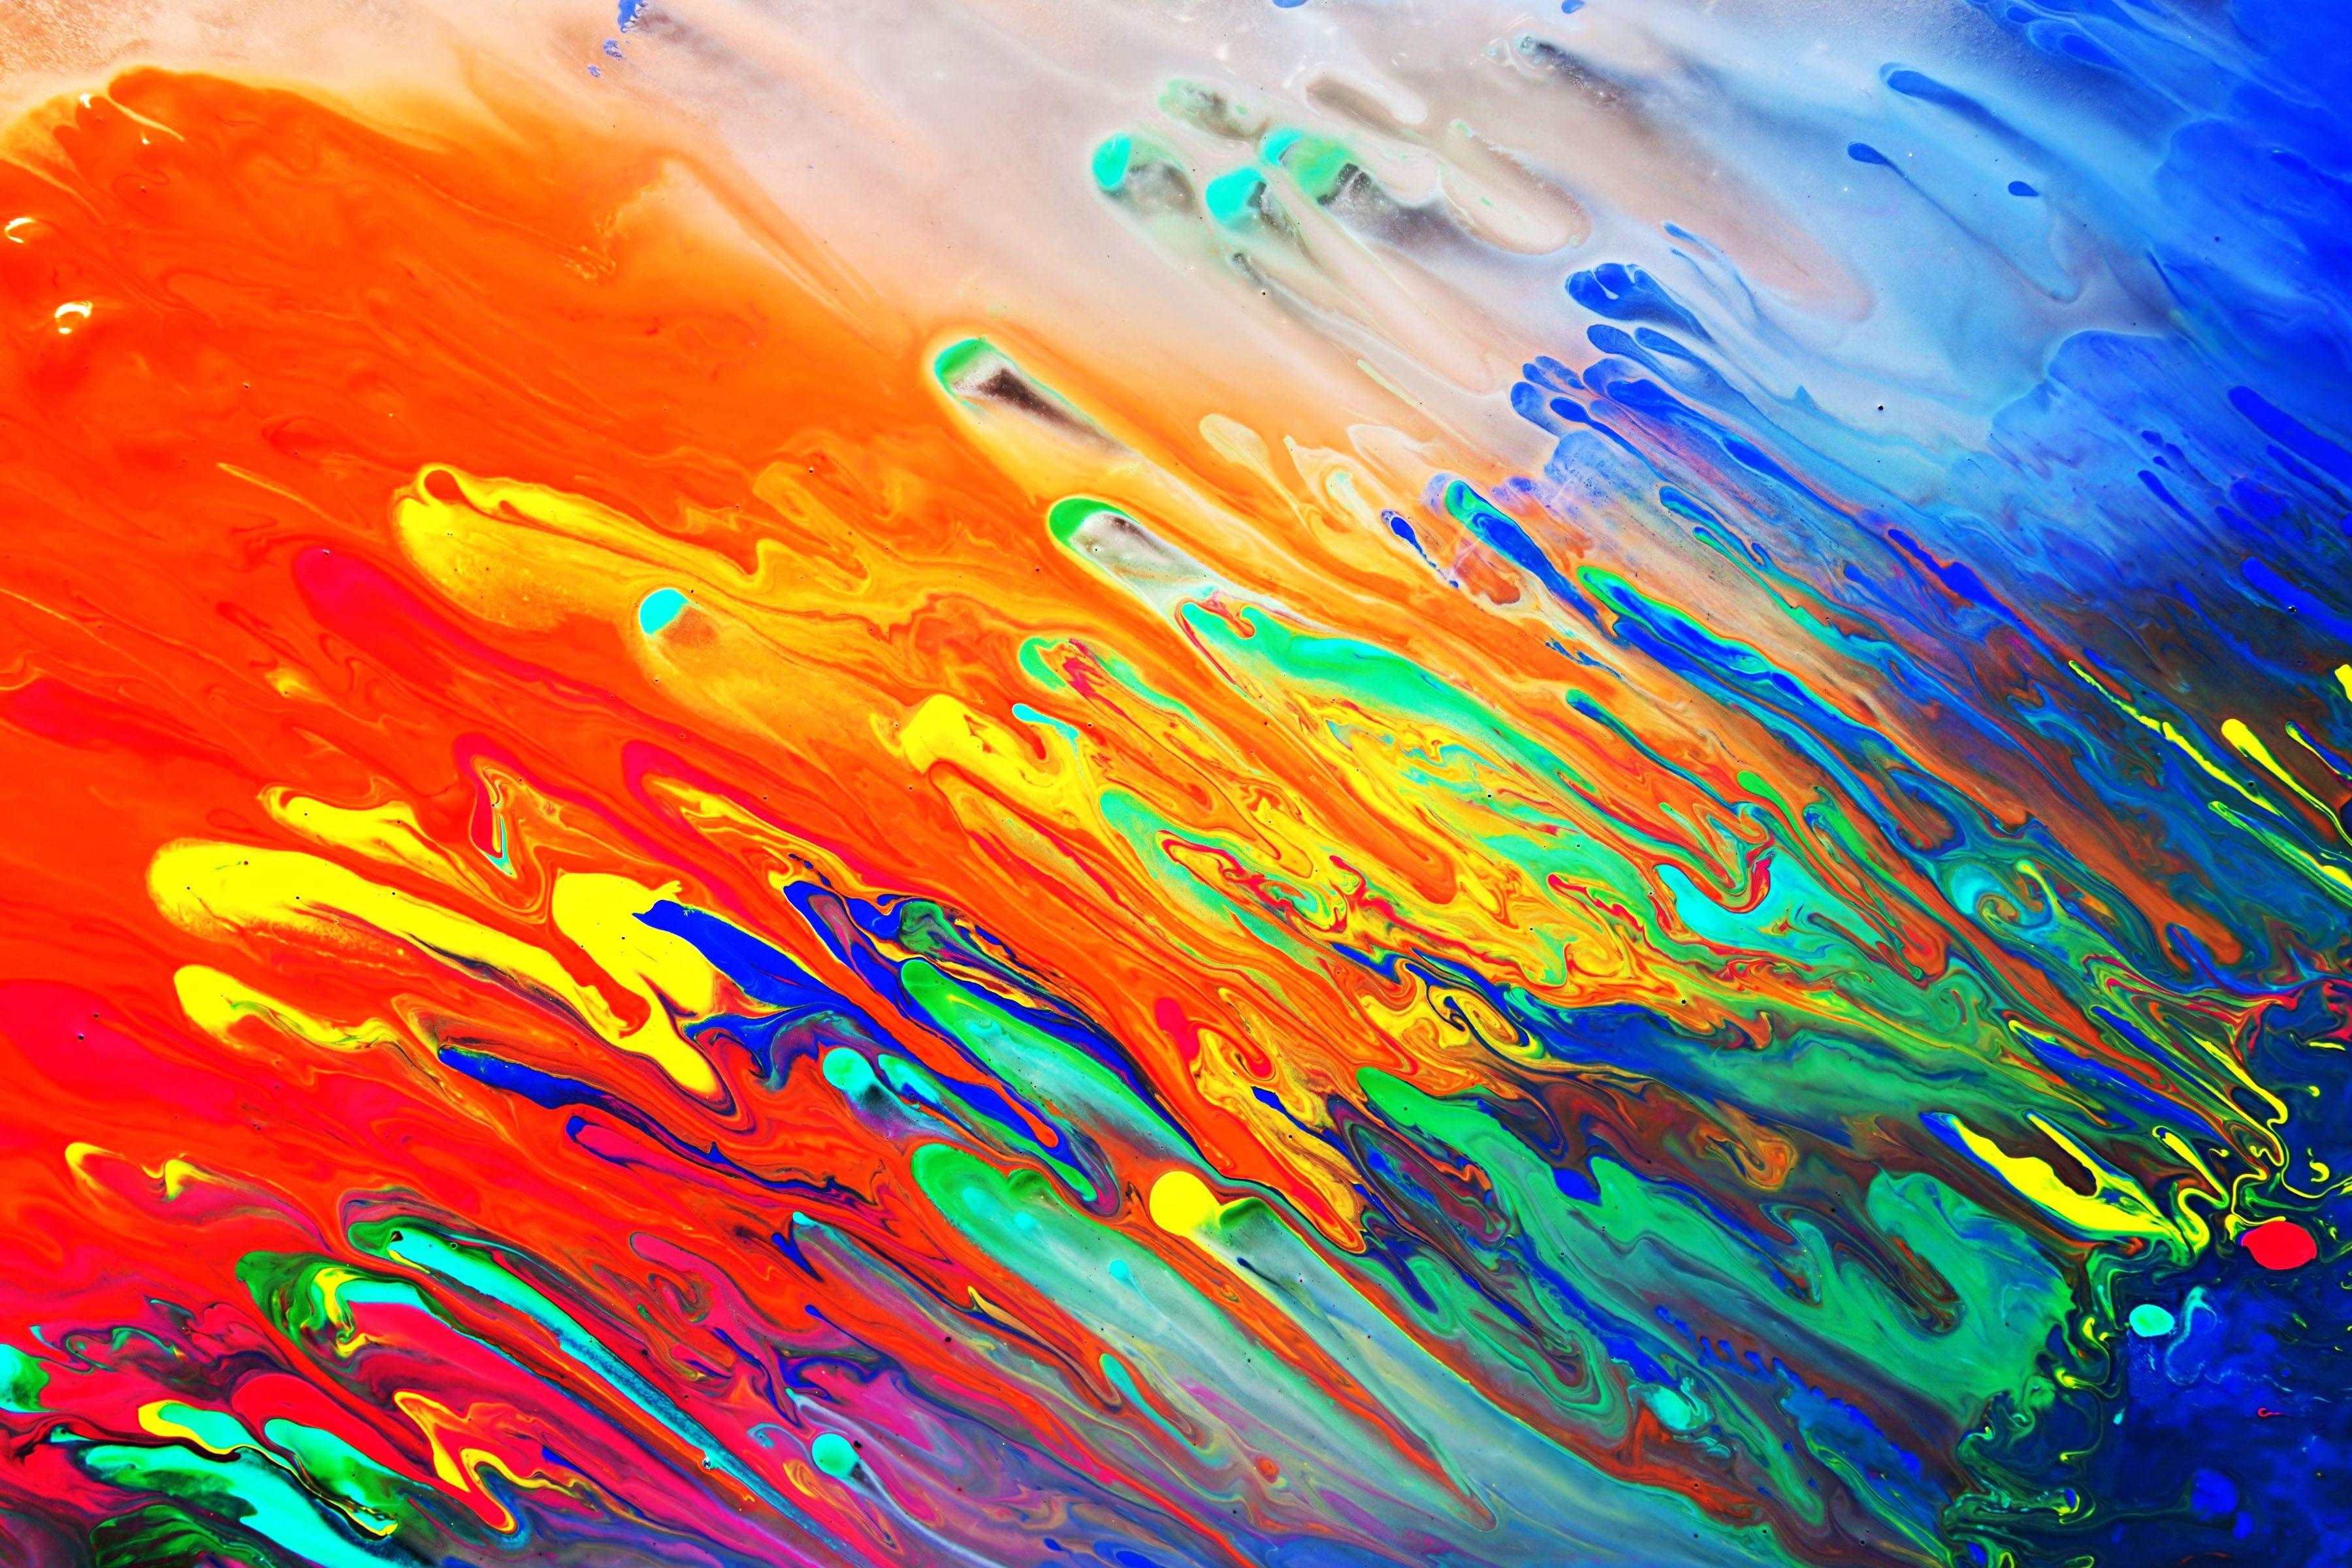 Abstract, Art, Mixed, Media, Grunge, Stock, Photo, Painting